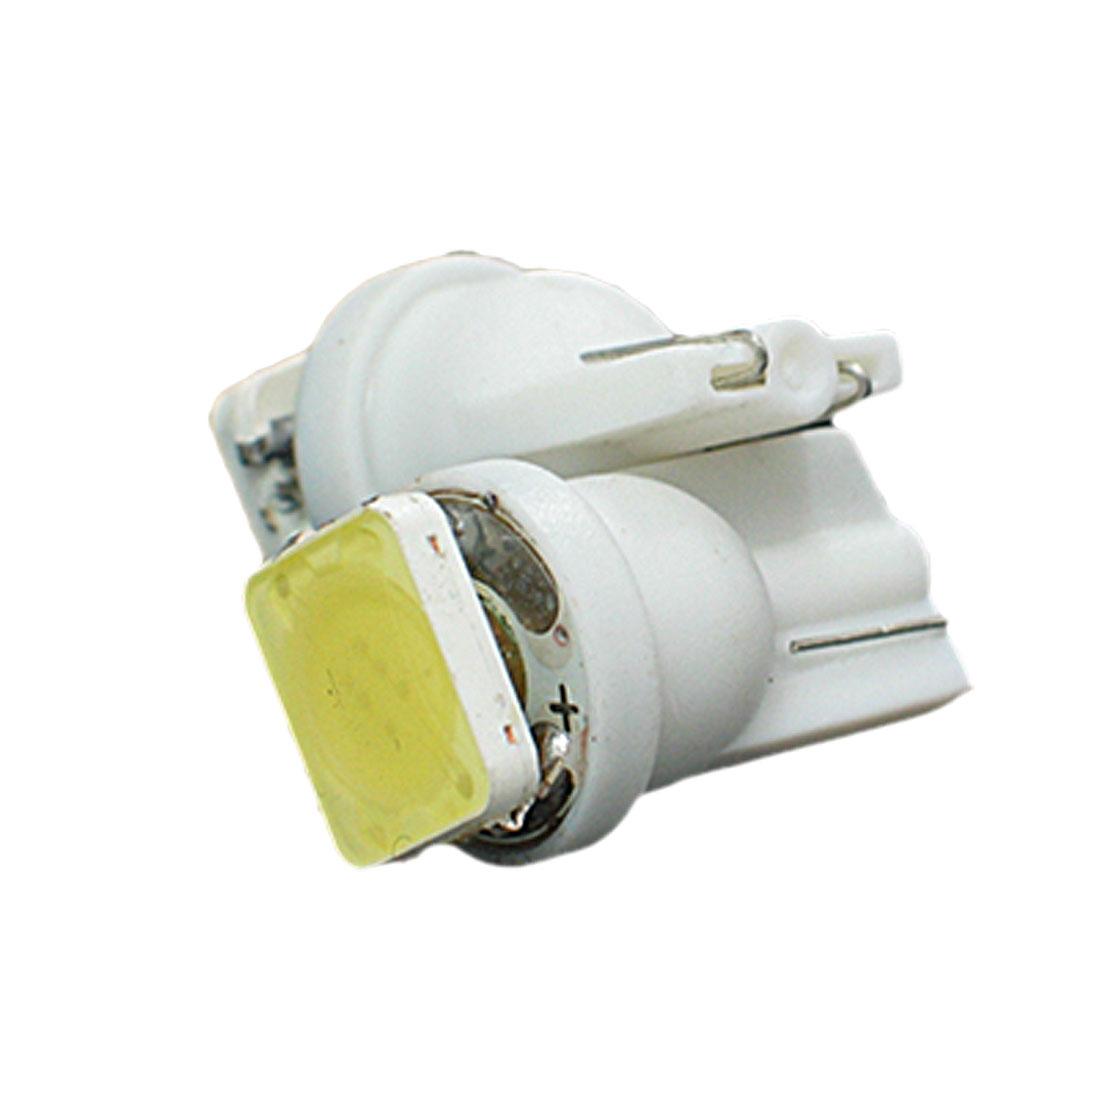 2 Pcs T10 194 168 W5W Wedge White 1 SMD LED Brake Rear Lamp Turn Light for Car Auto